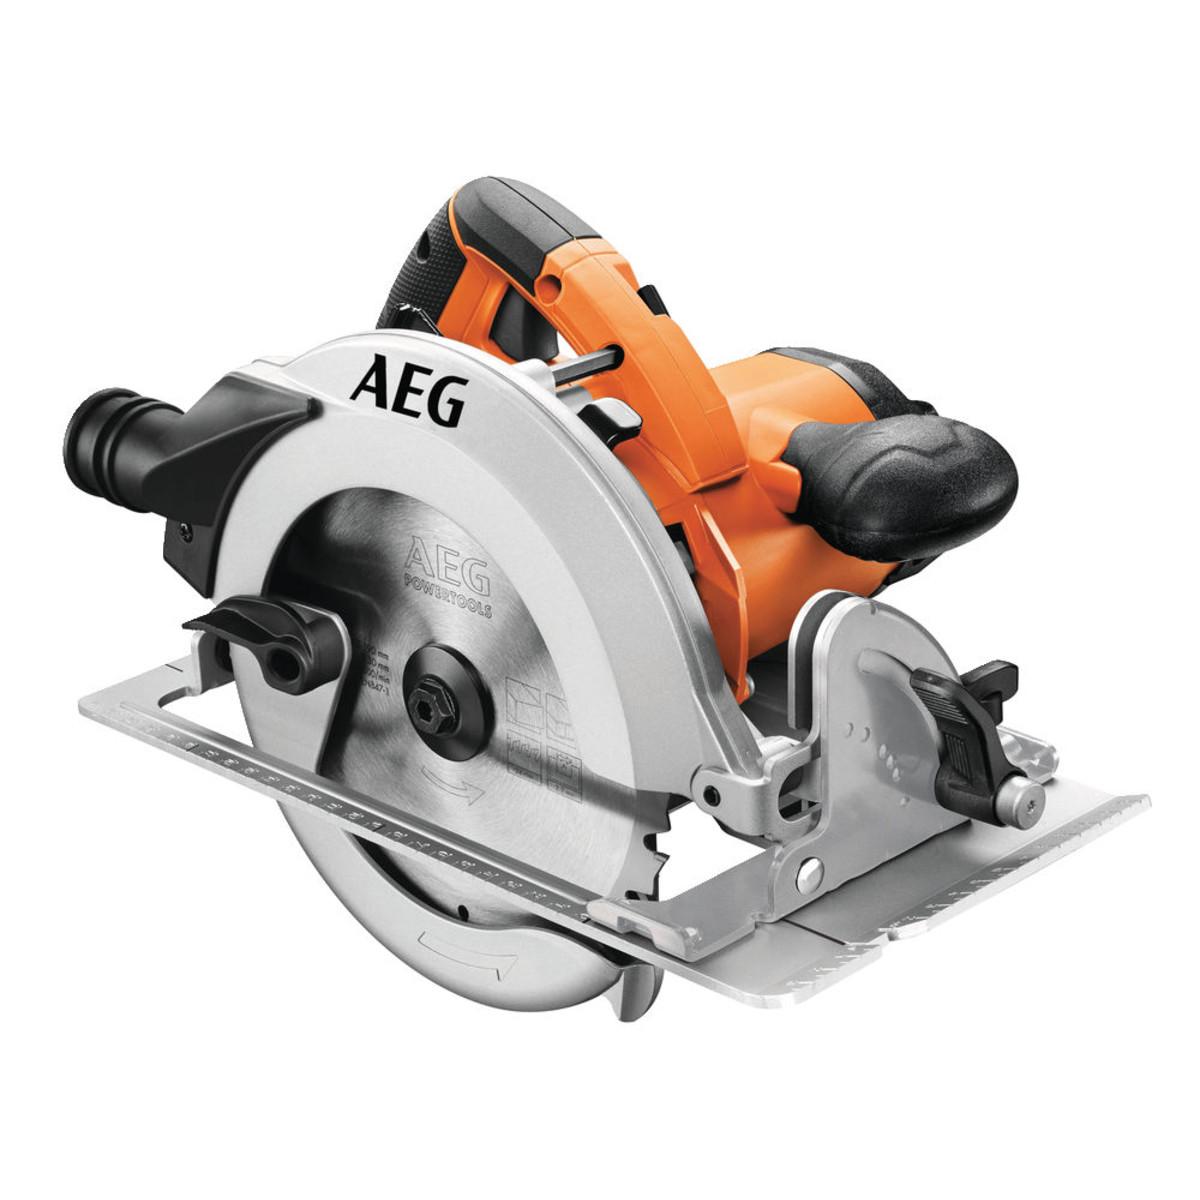 Циркулярная профессиональная пила AEG KS 66-2 1600Вт 190 мм